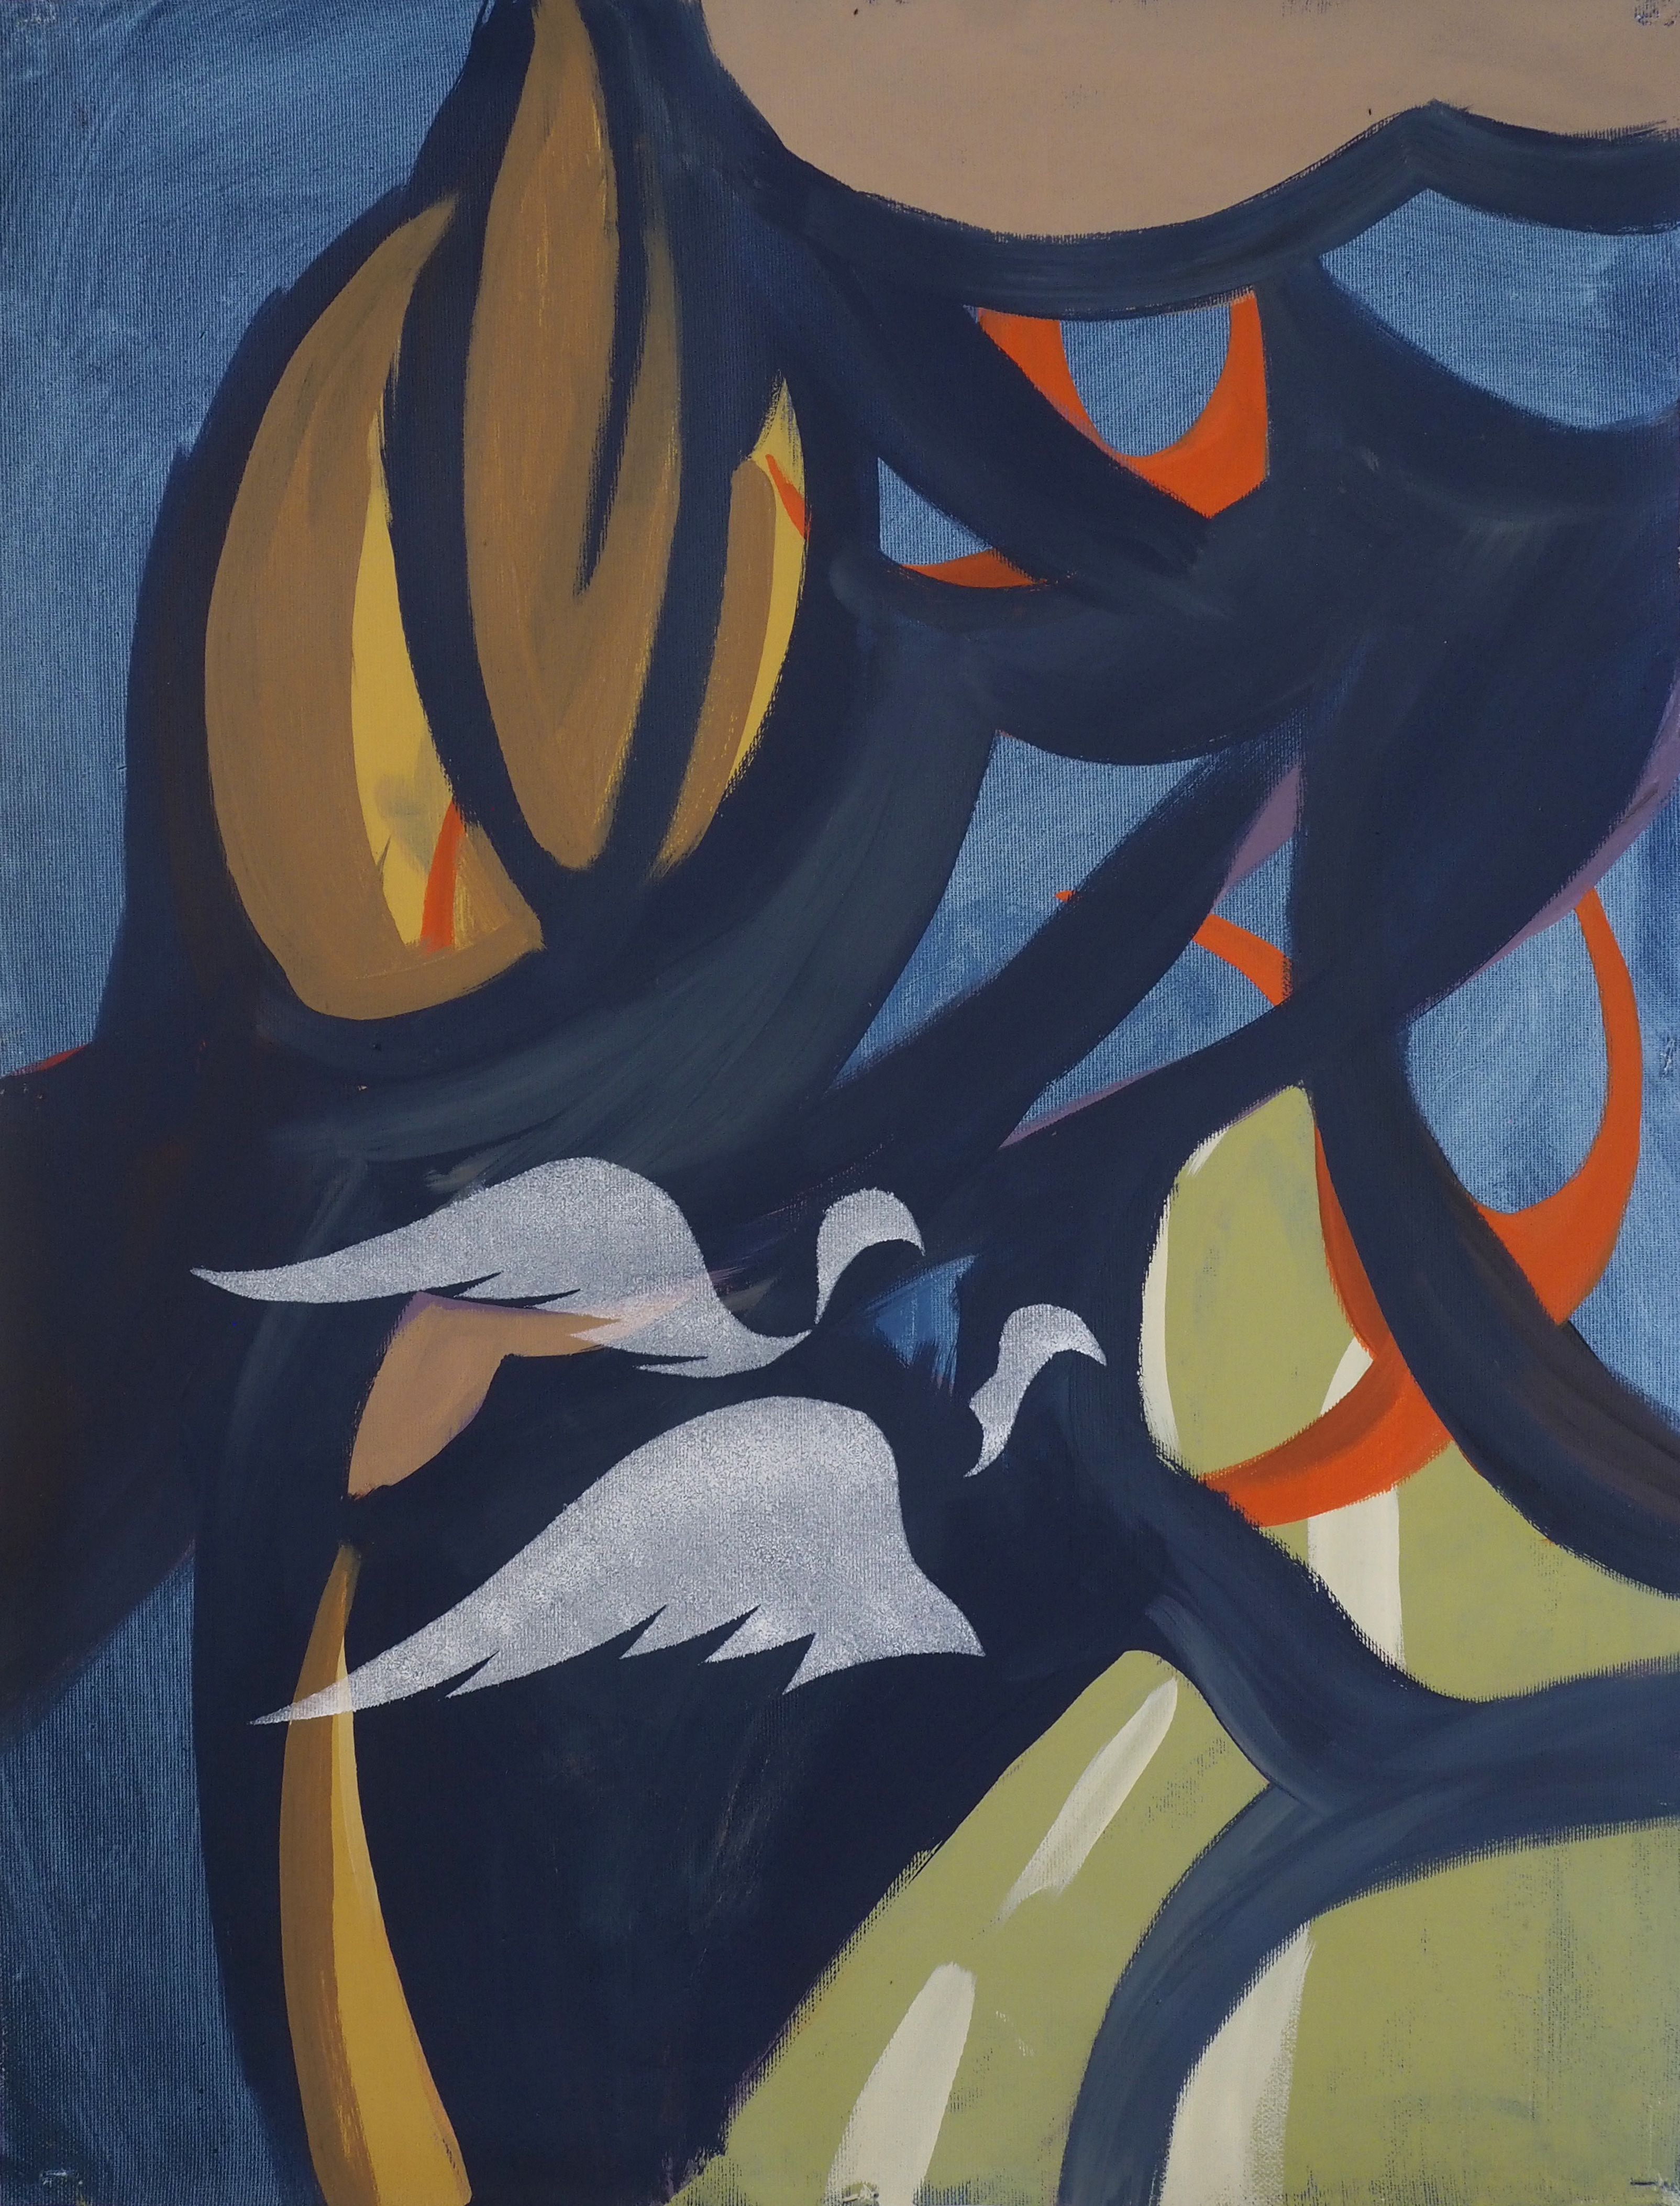 'Ascetic Life' (I), Oil on Linen, 62x48cm